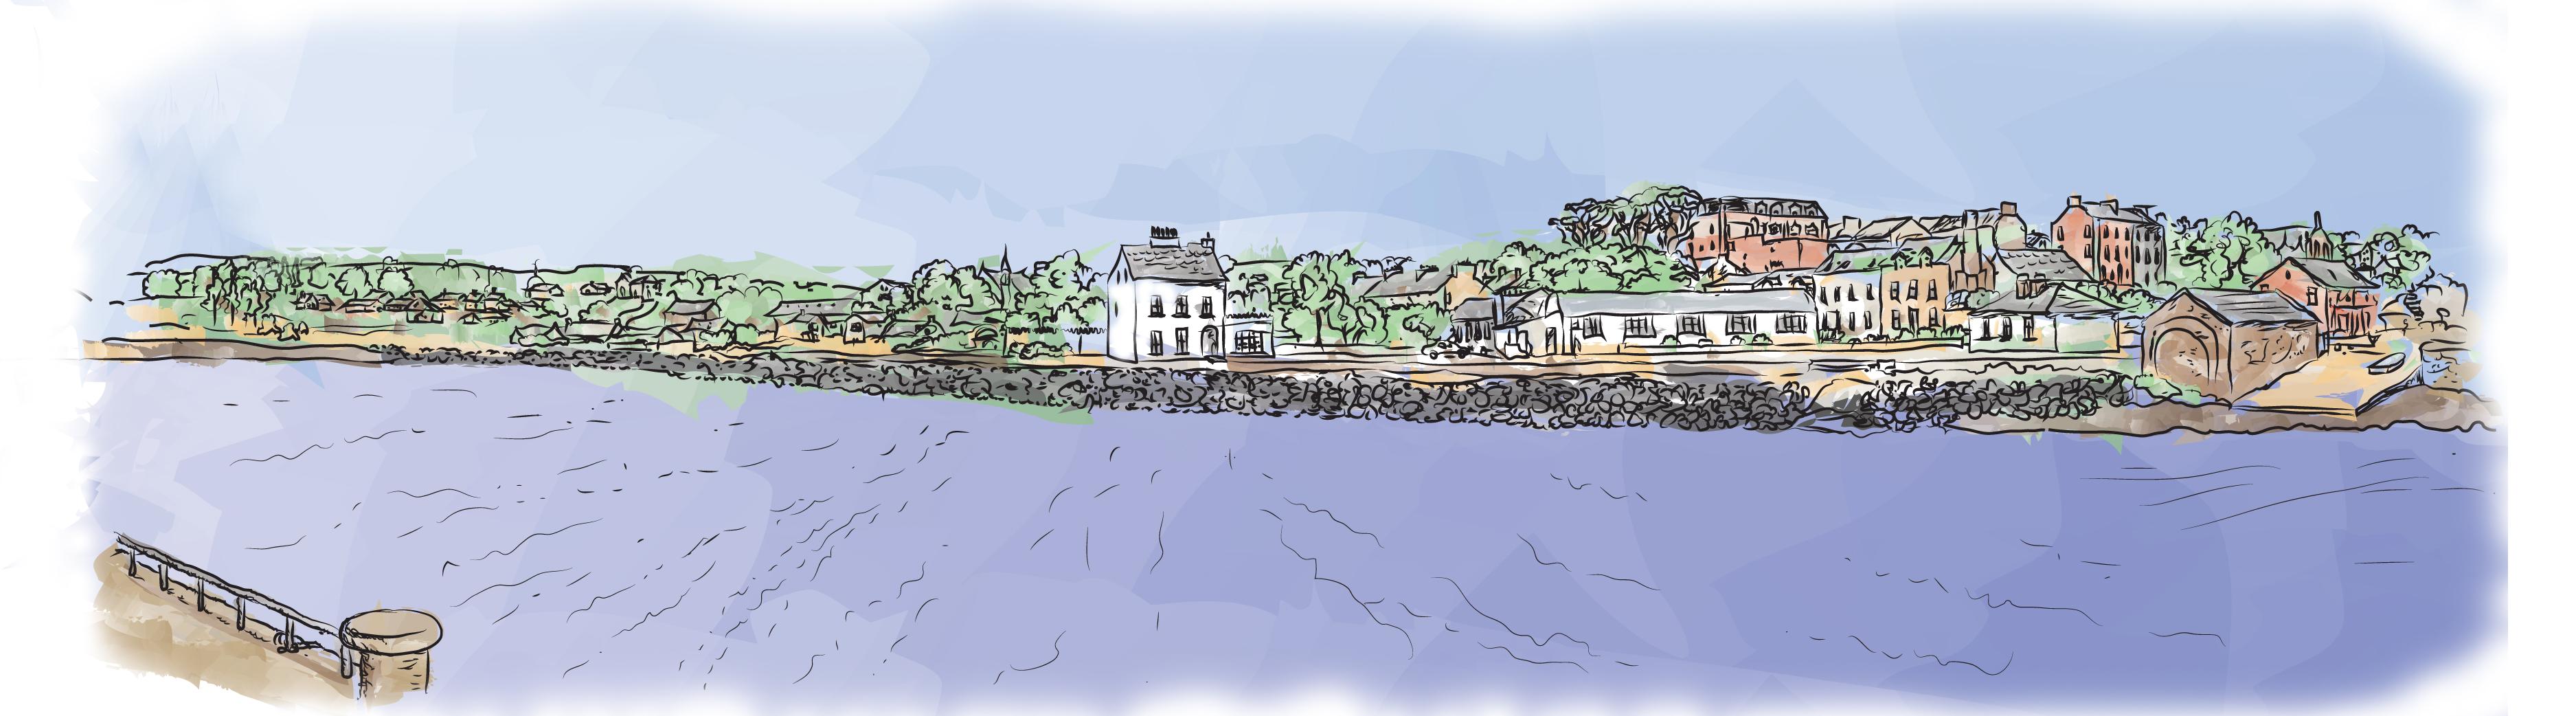 dibujo de Donegal